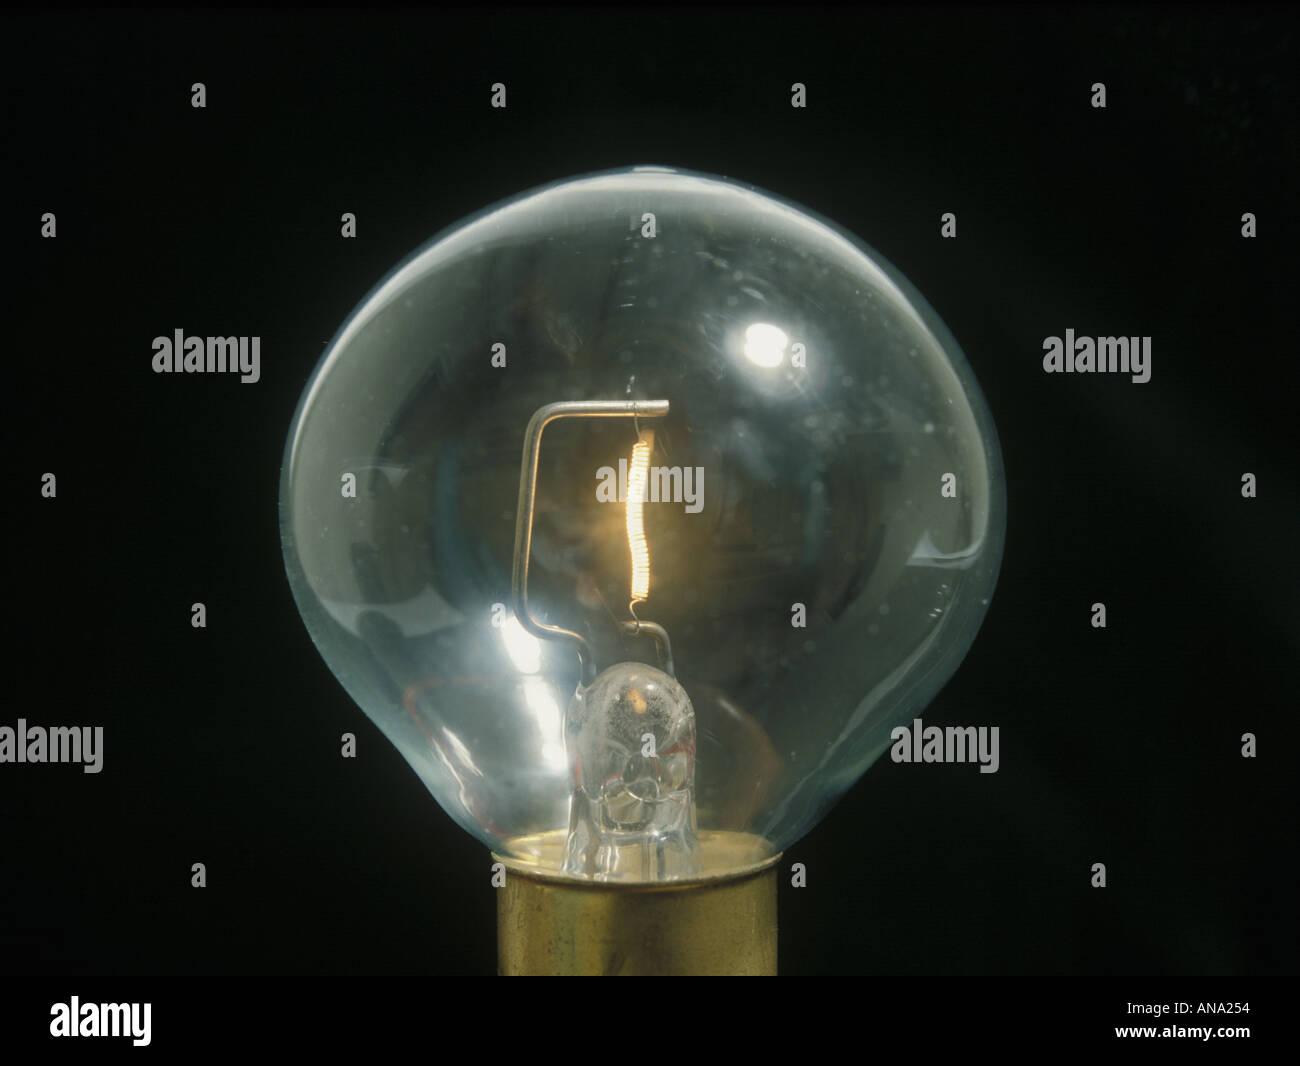 12 volt tungsten filament lamp - Stock Image